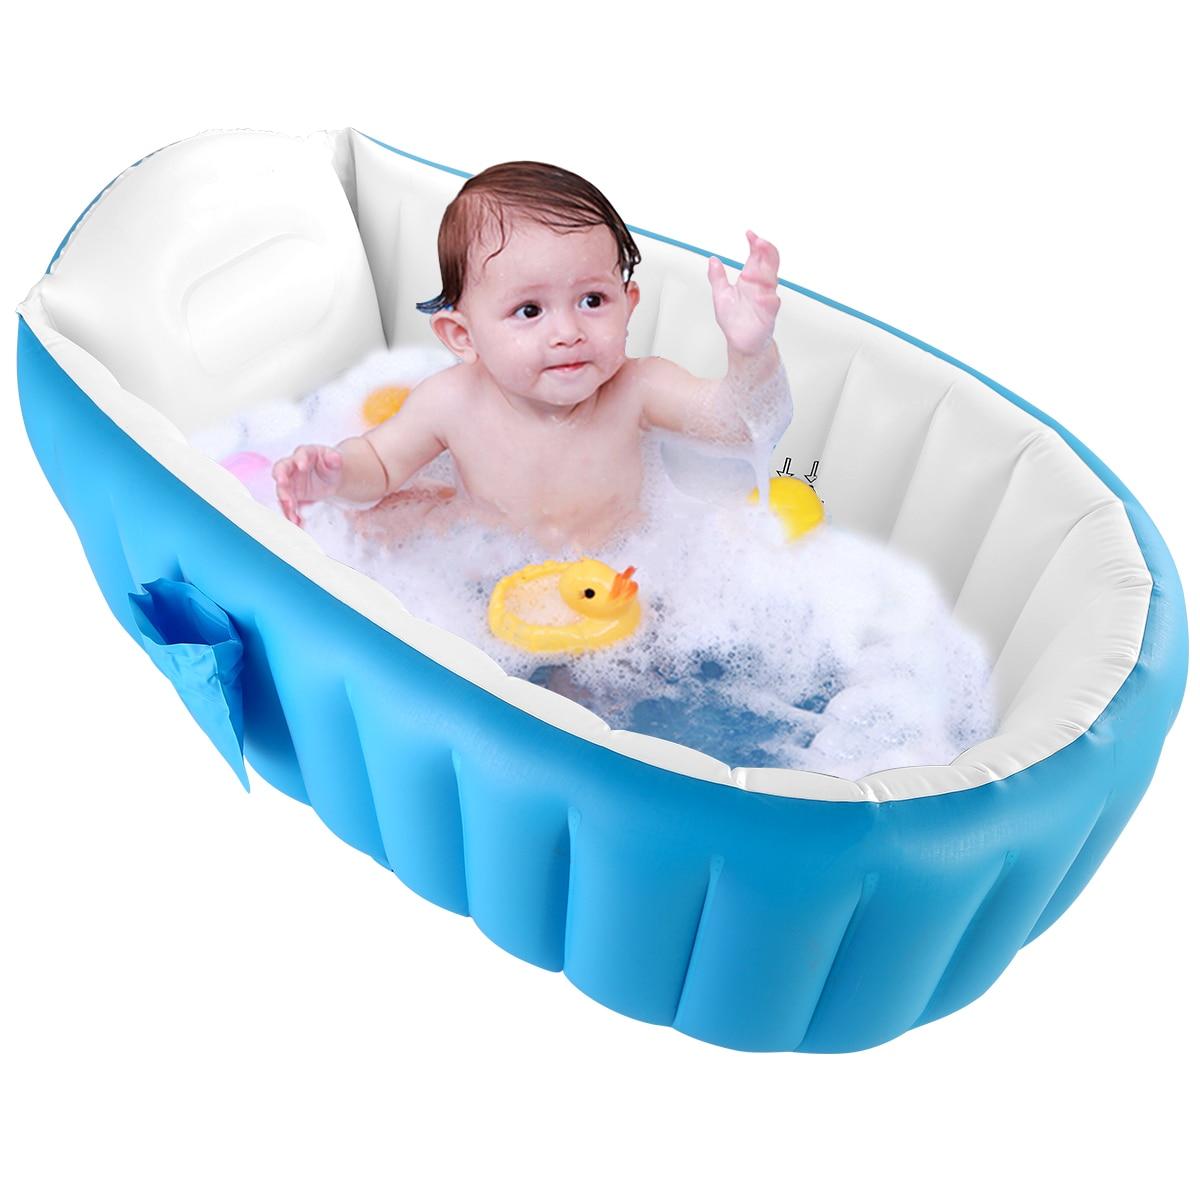 Newborn Baby Bath Basin Safety Inflatable Bathtub Collapsible Air Swimming Pool Child Tub No Cushion Foot Air Pump Coussin Bain